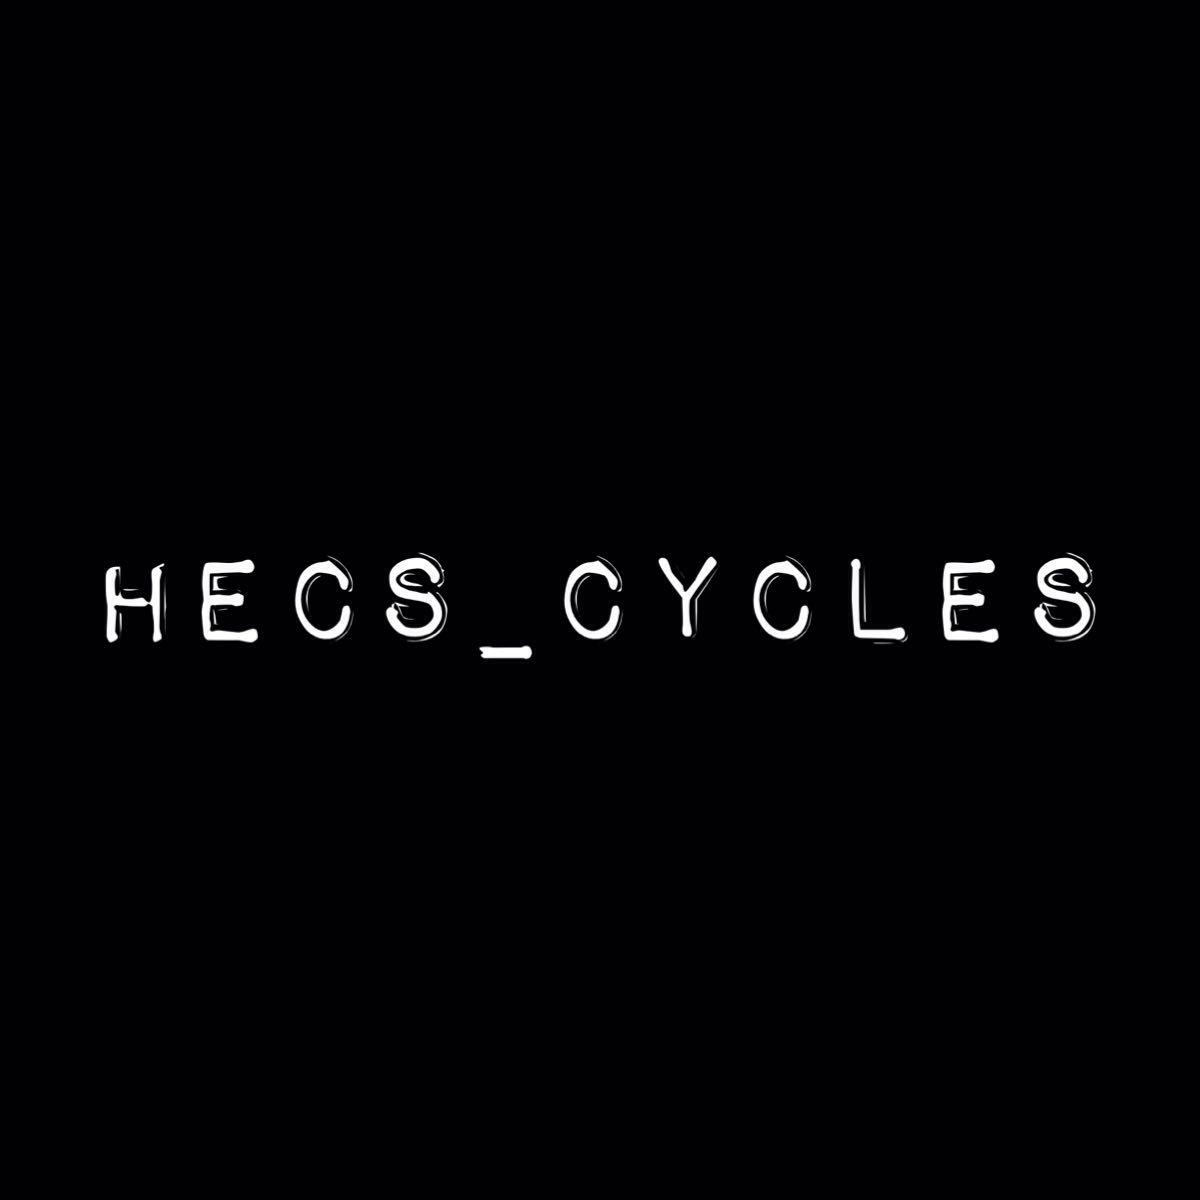 hecs_cycles